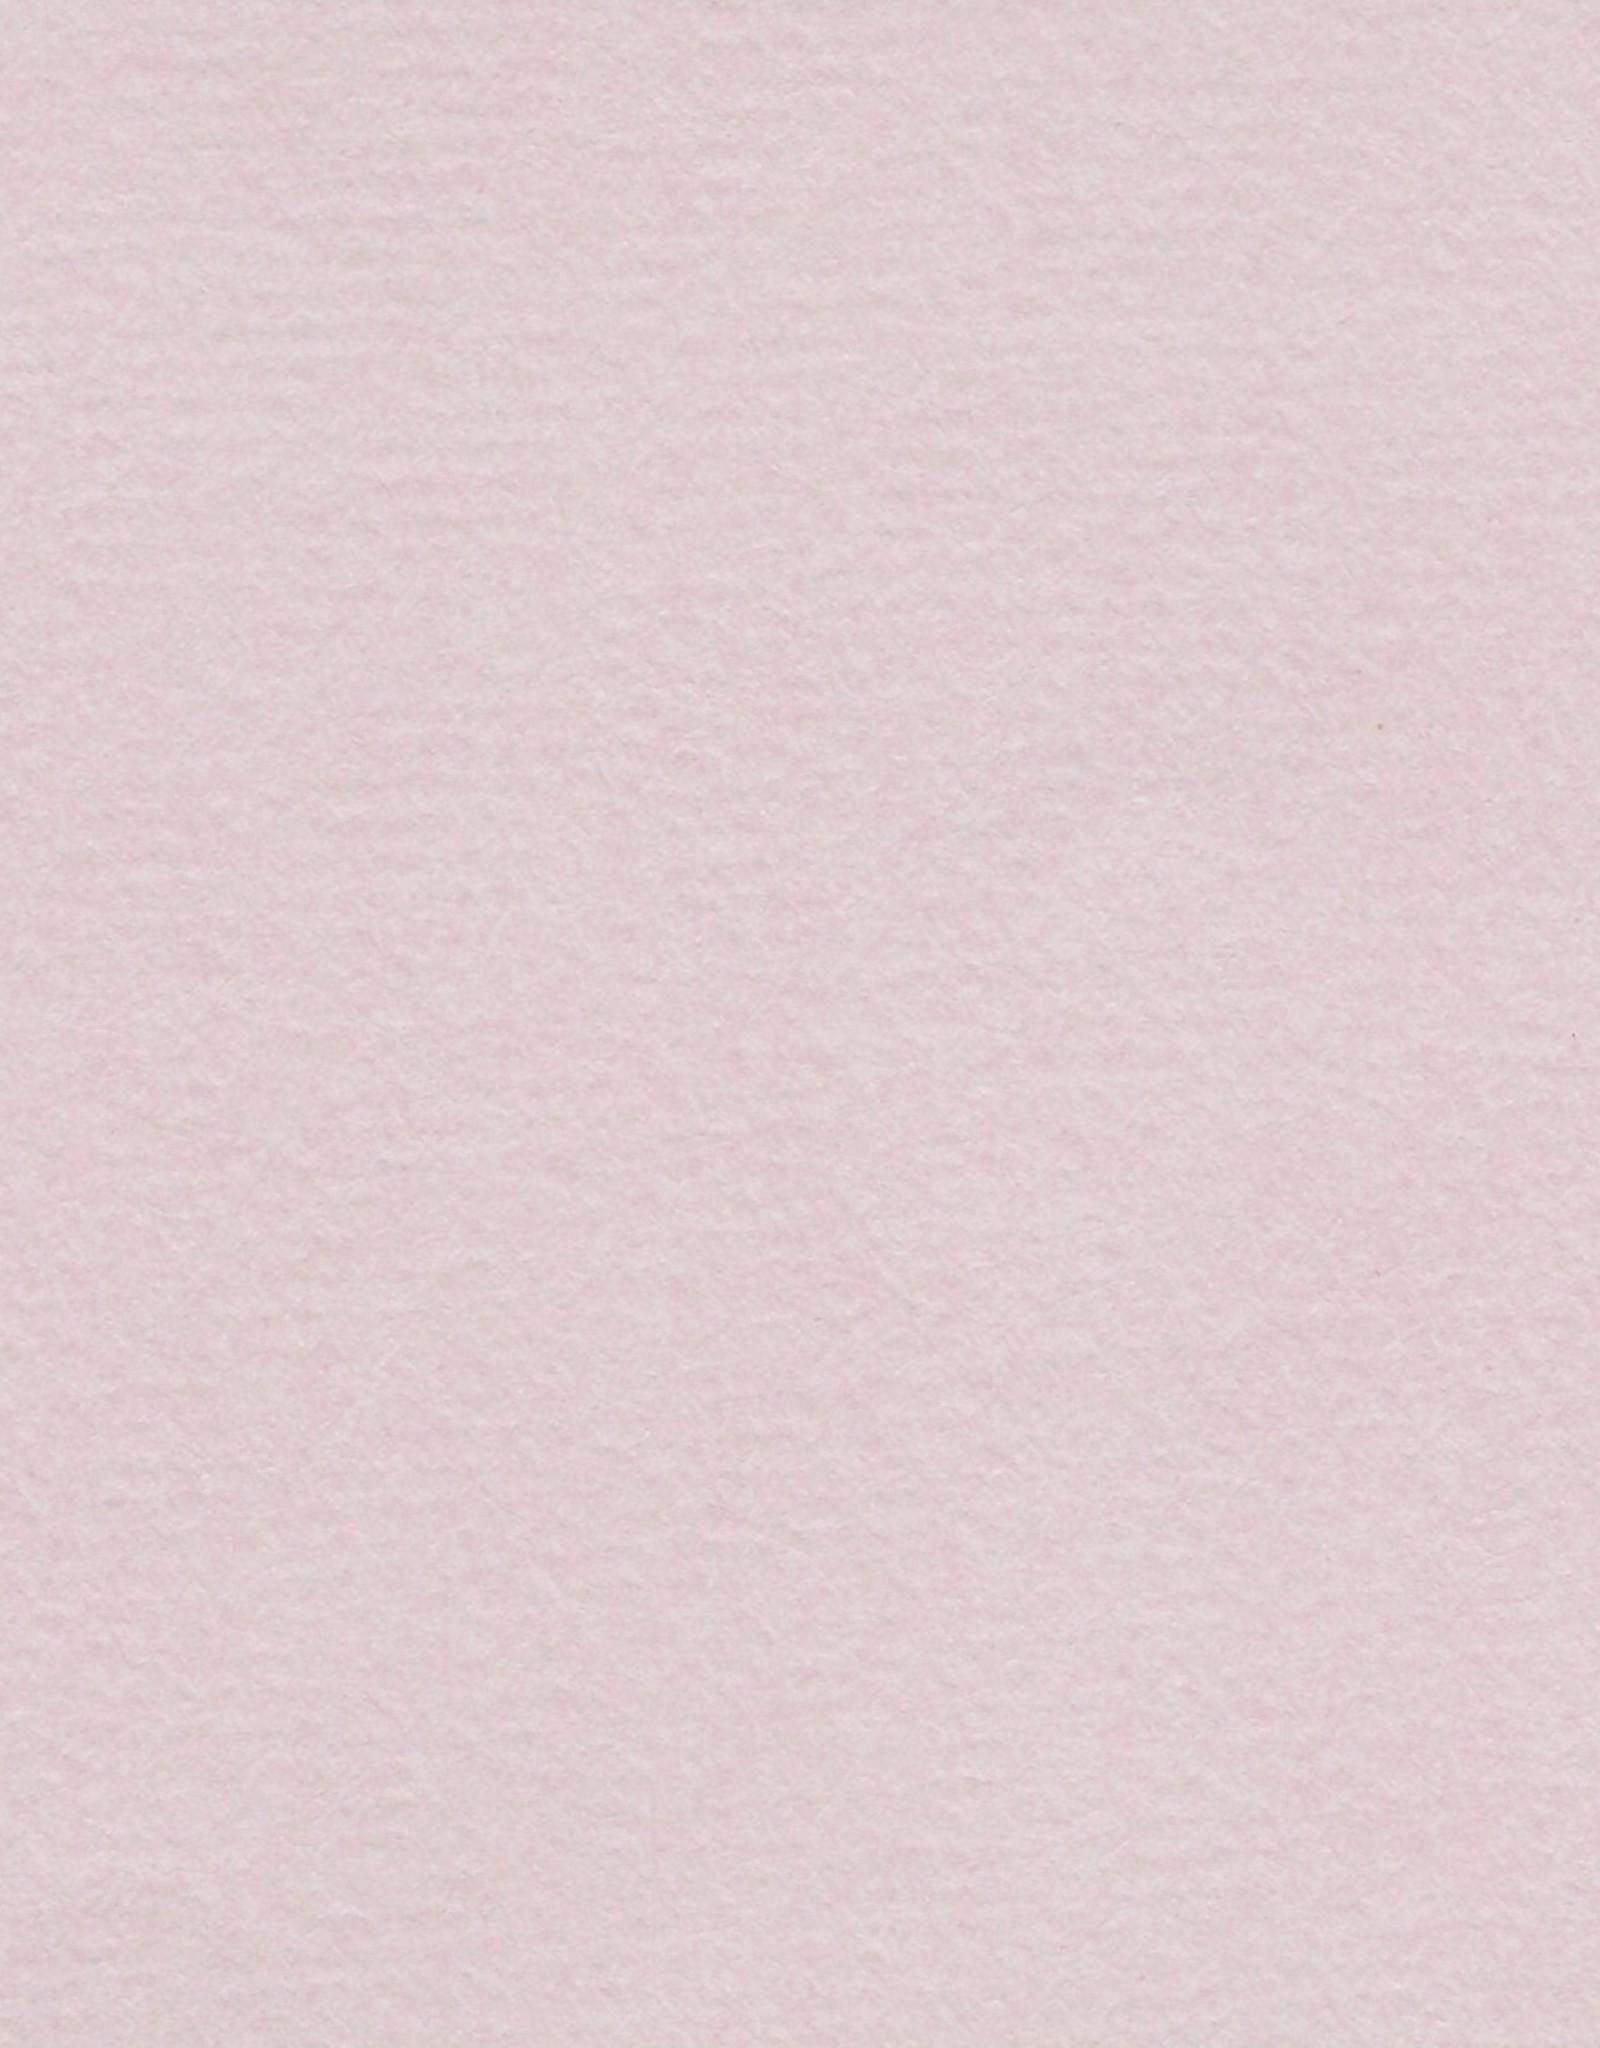 "Hahnemuhle Bugra, Mellow Pink #320, 33"" X 41"" 130 gsm"